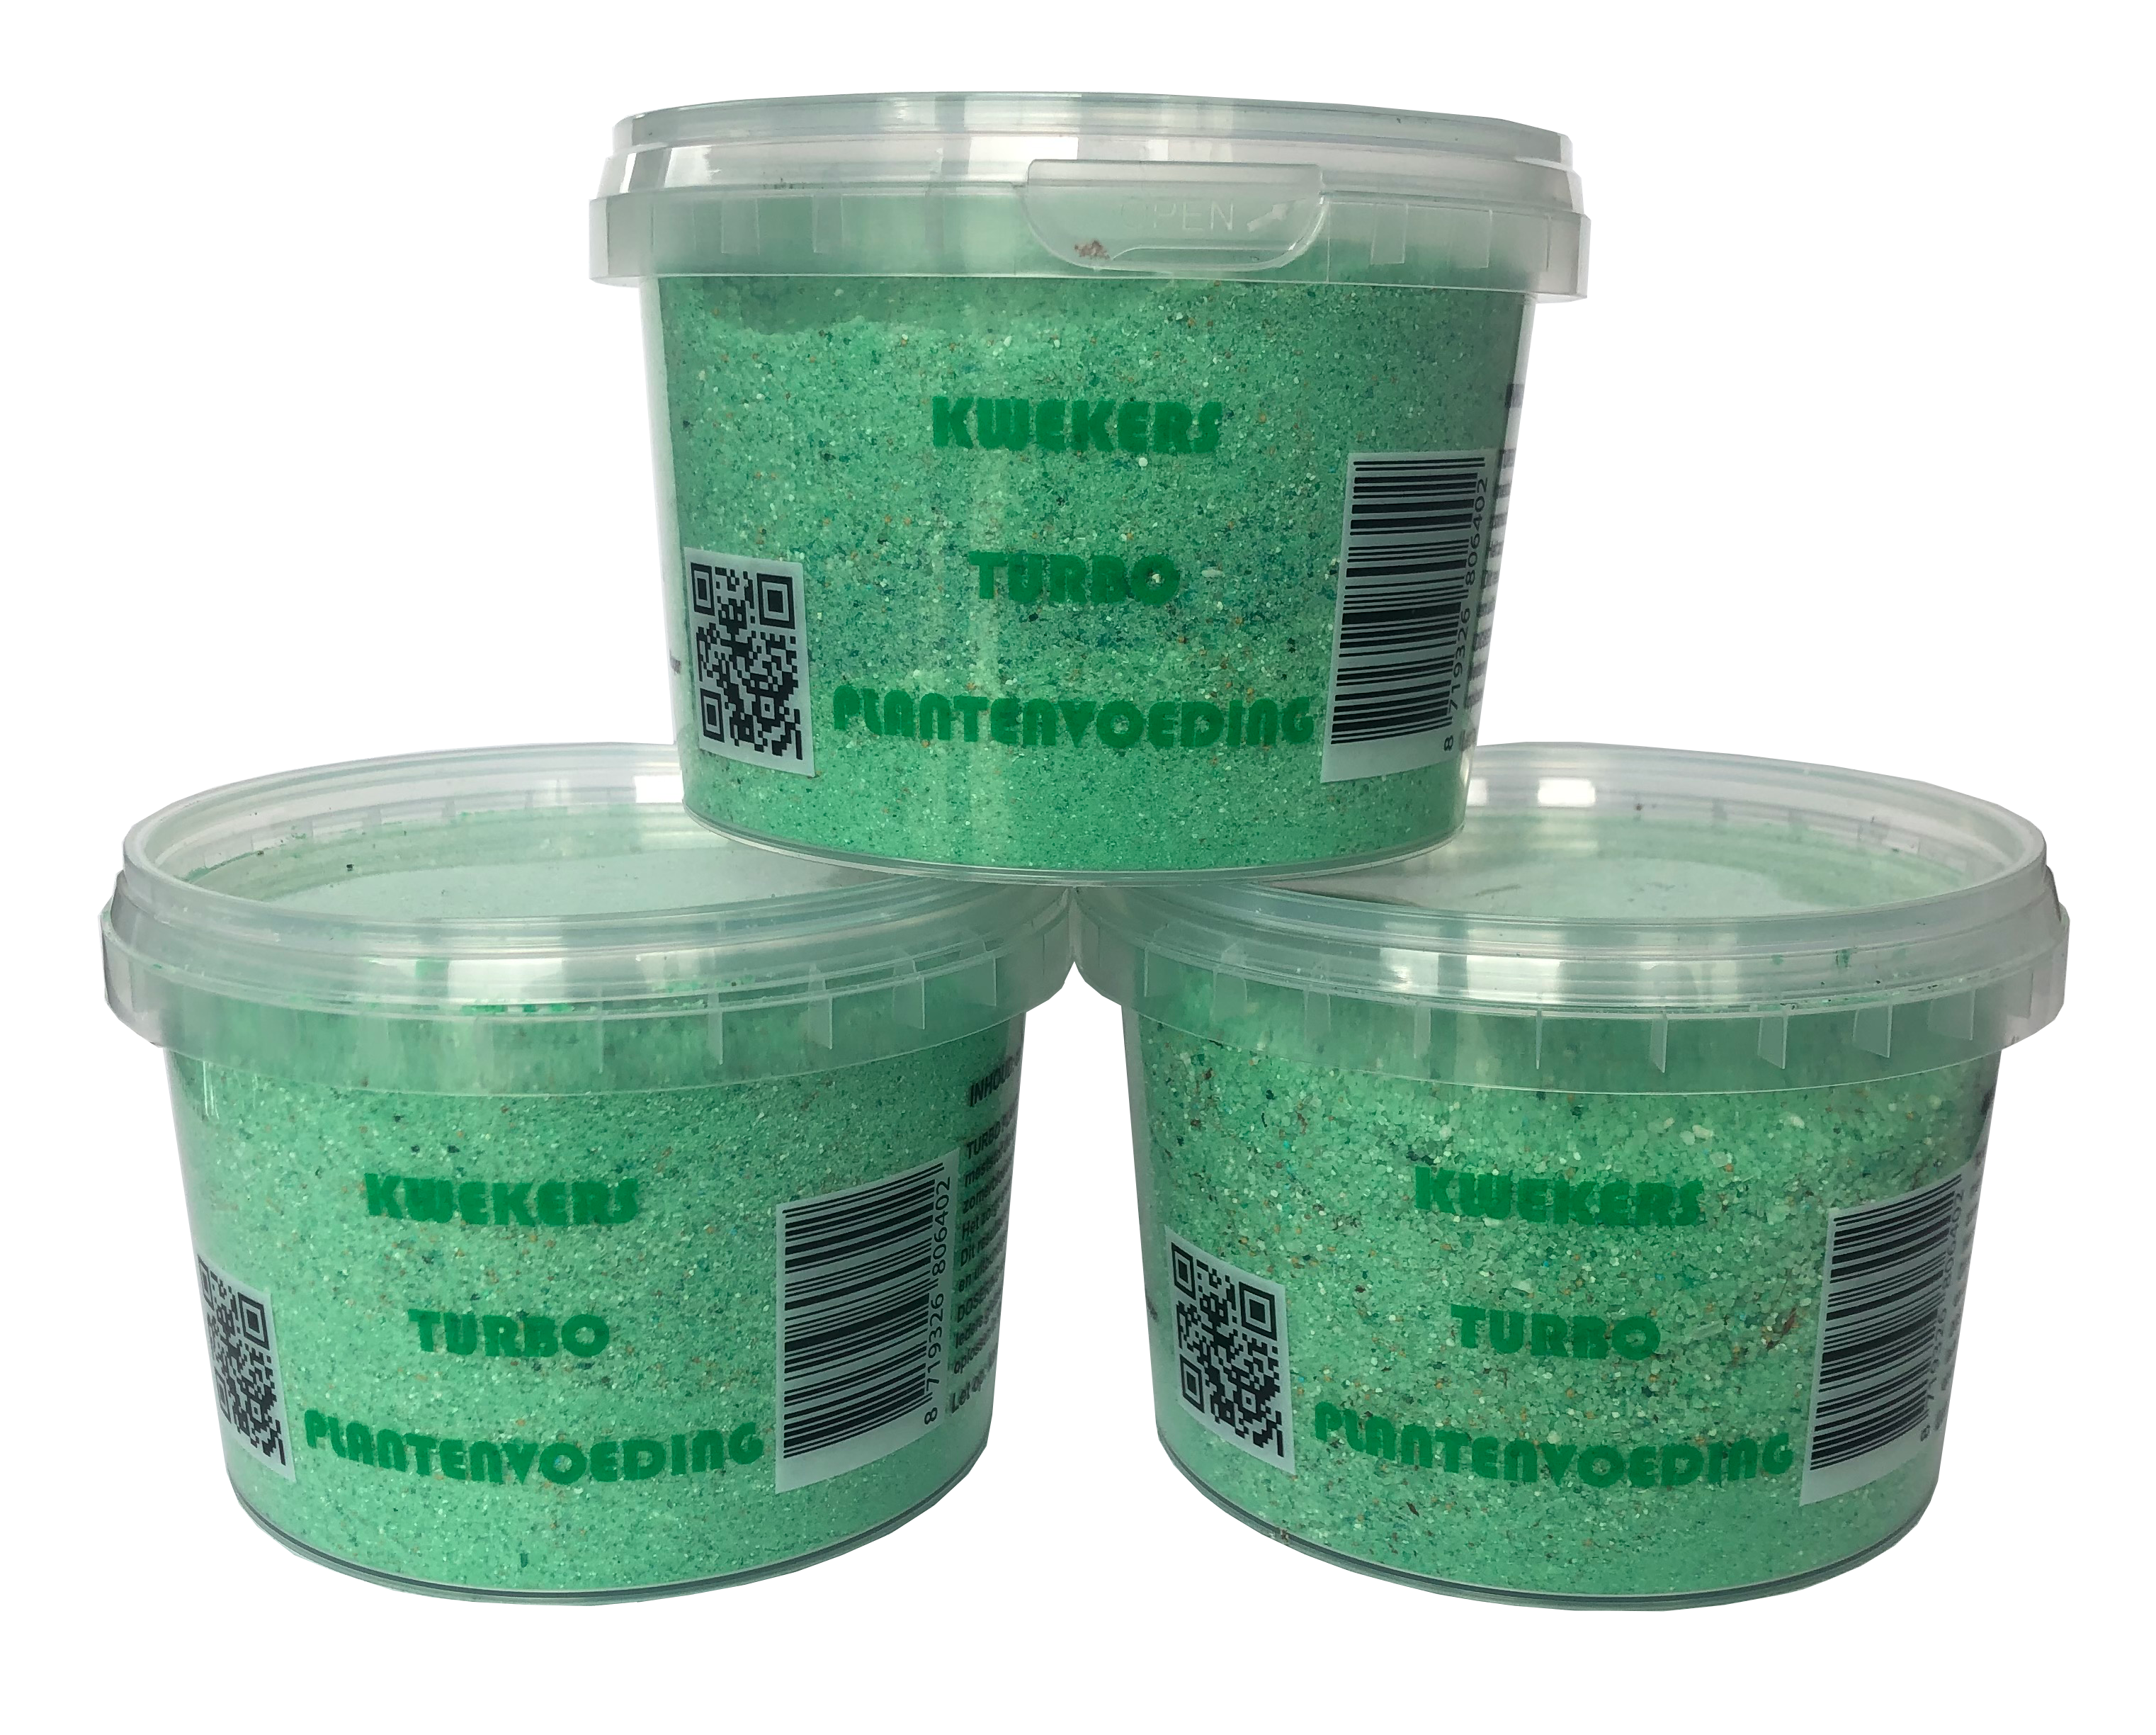 Kwekers Turboplantenvoeding 3x 500g